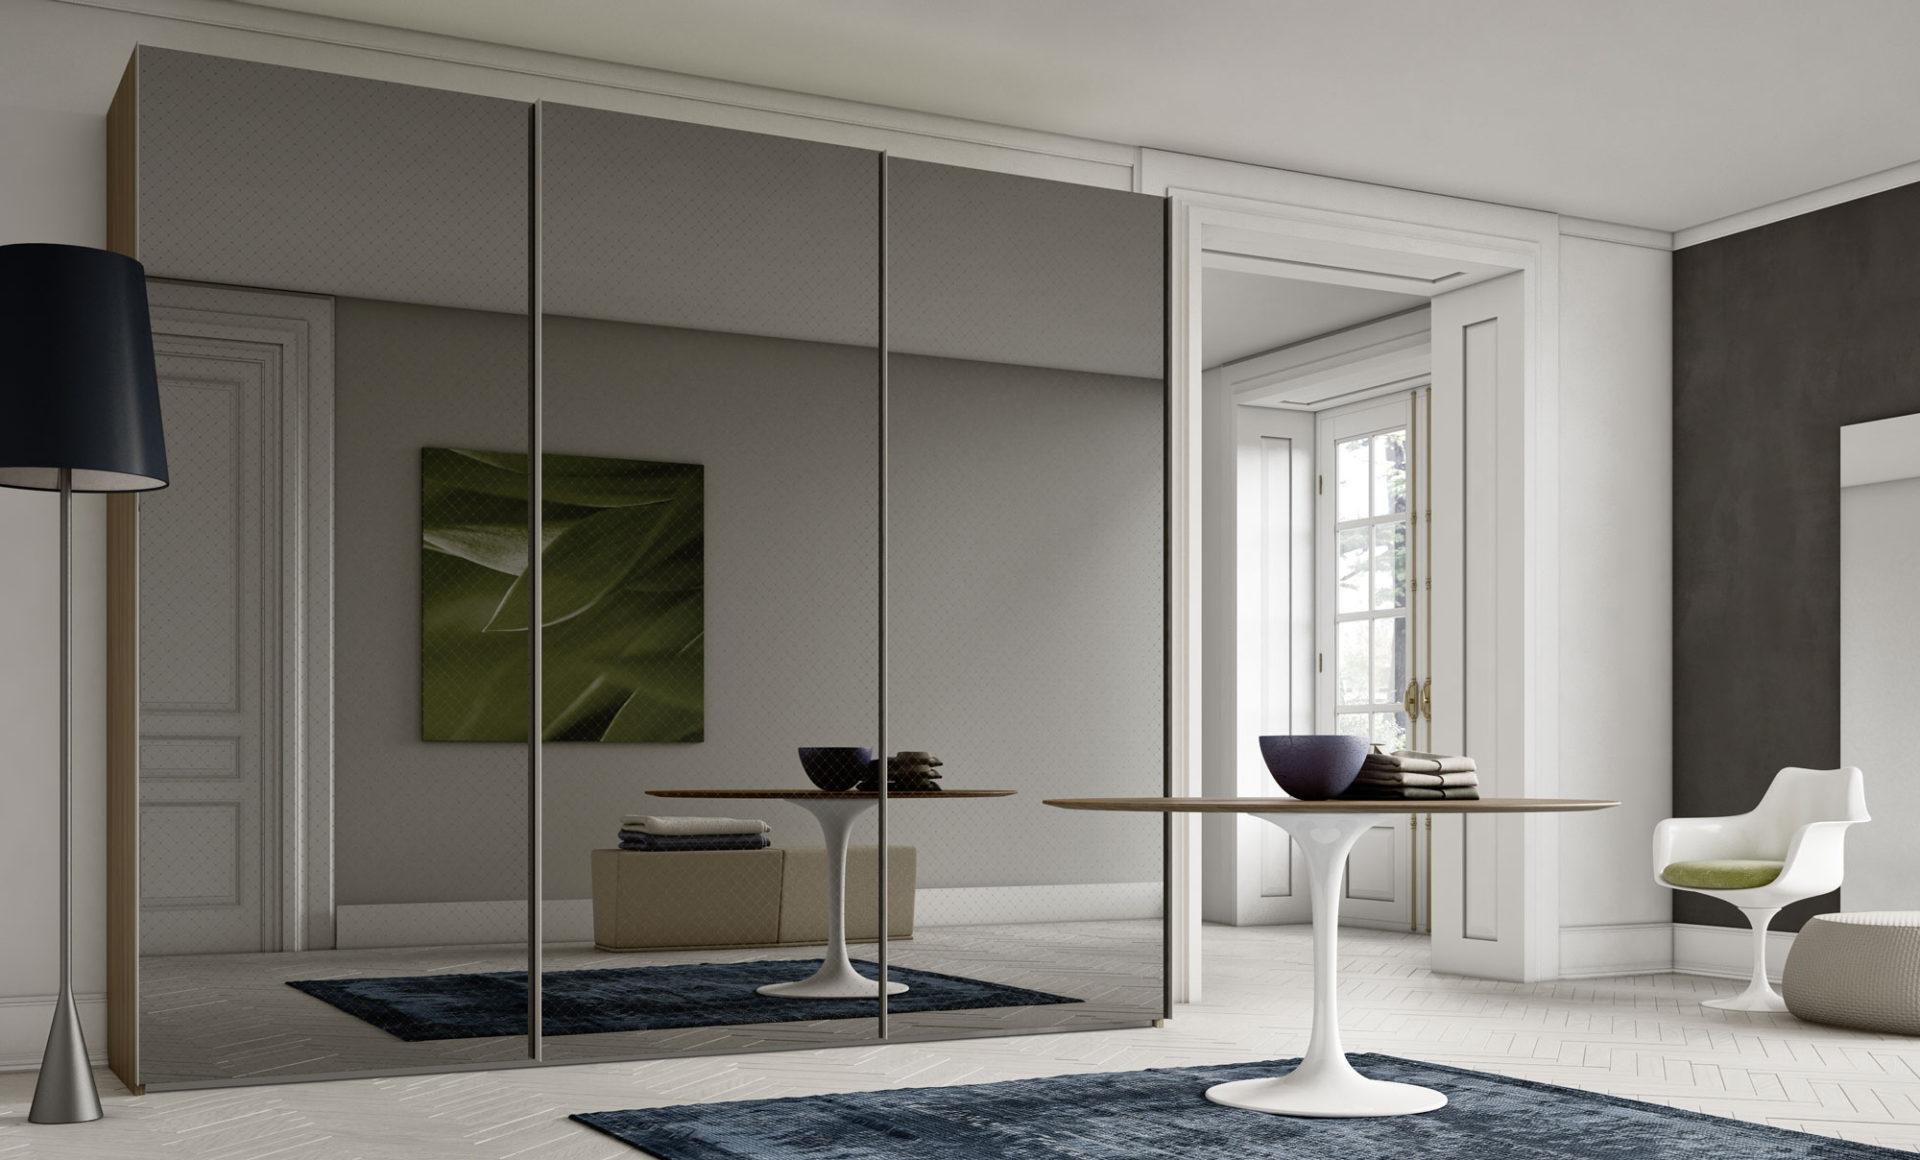 Armadio anta scorrevole solaris orme - Ikea armadio con specchio ...